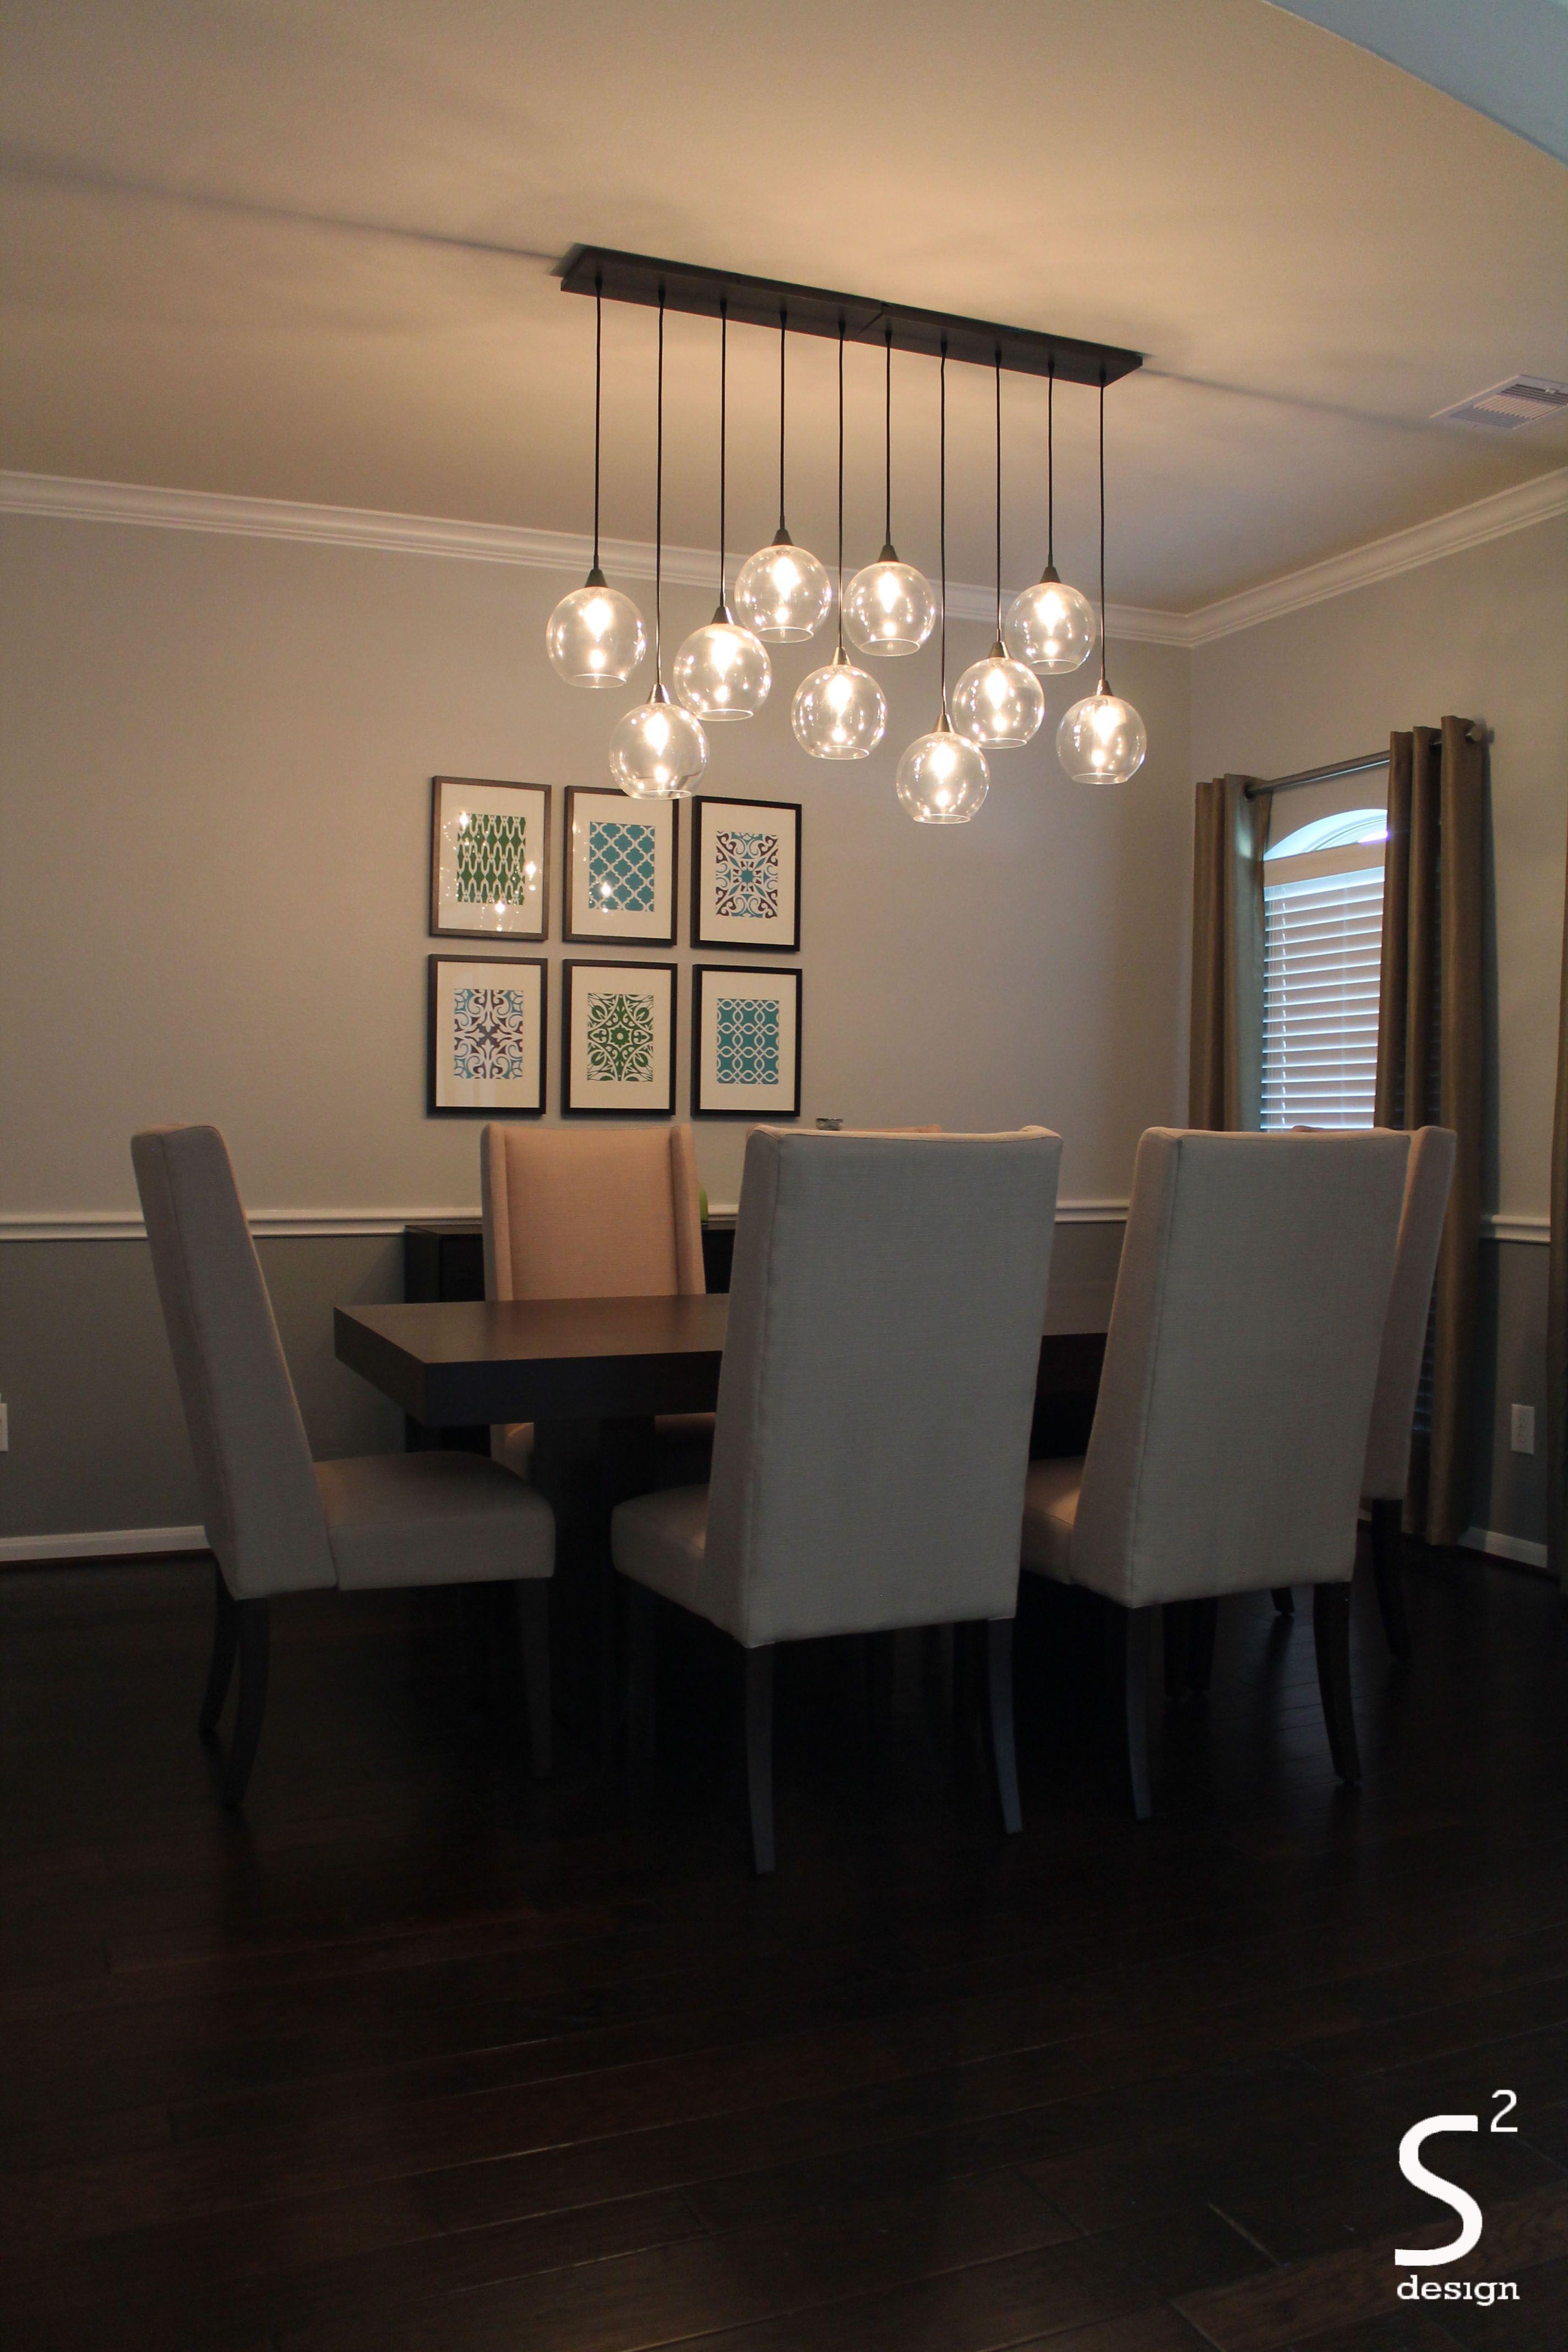 3 Harmonious Cool Ideas Painted Dining Furniture Dry Brus